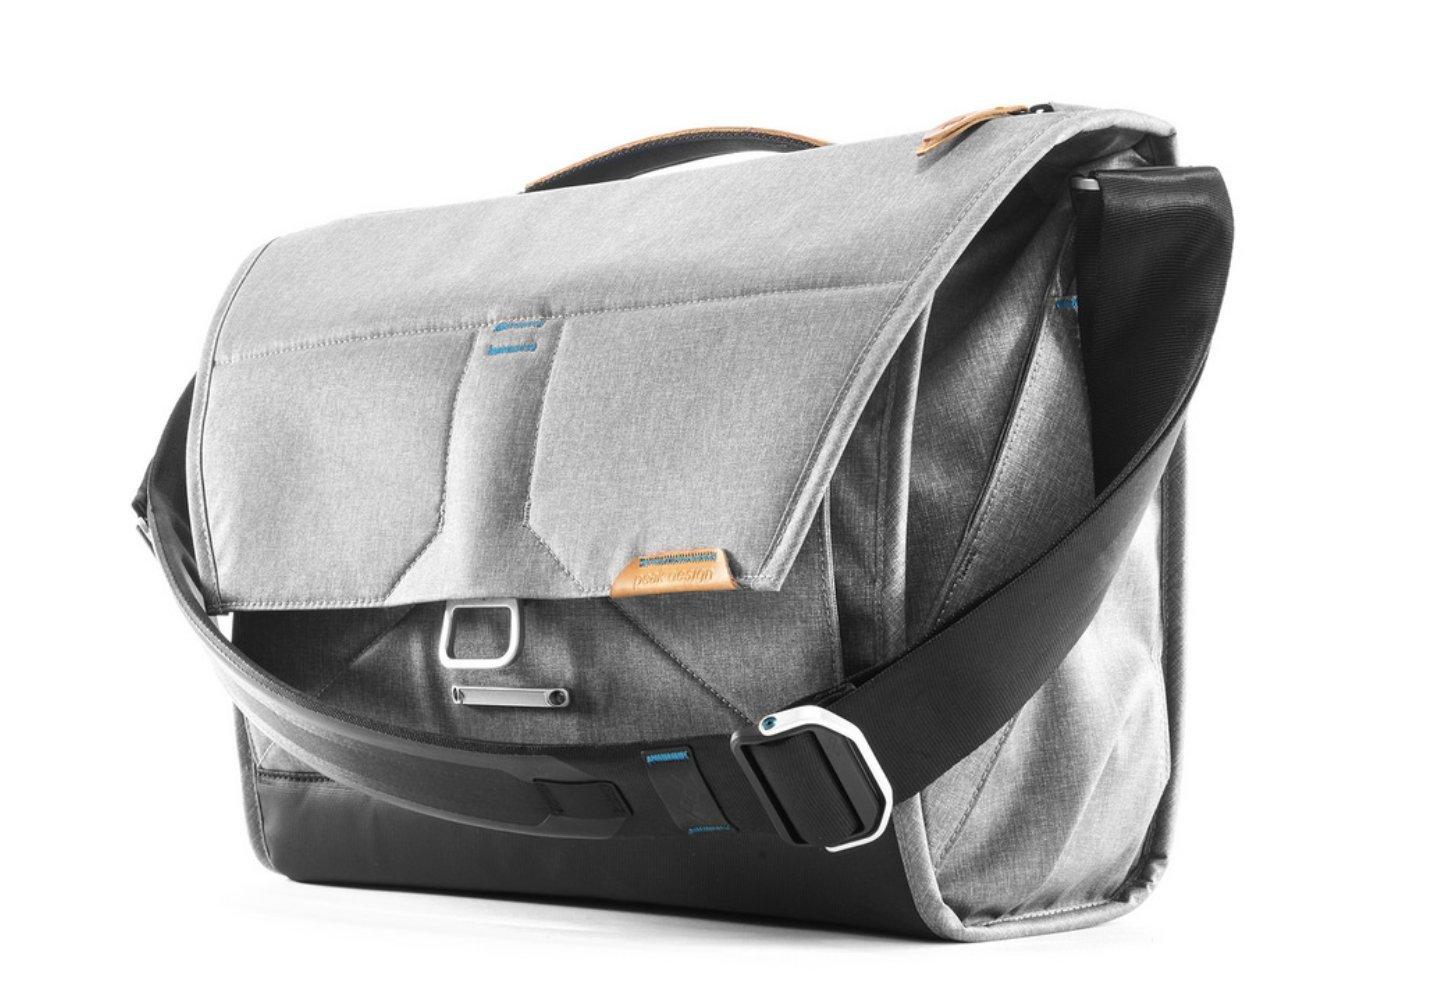 Peak Design Everyday Messenger Bag 15'' (Ash) by Peak Design (Image #1)